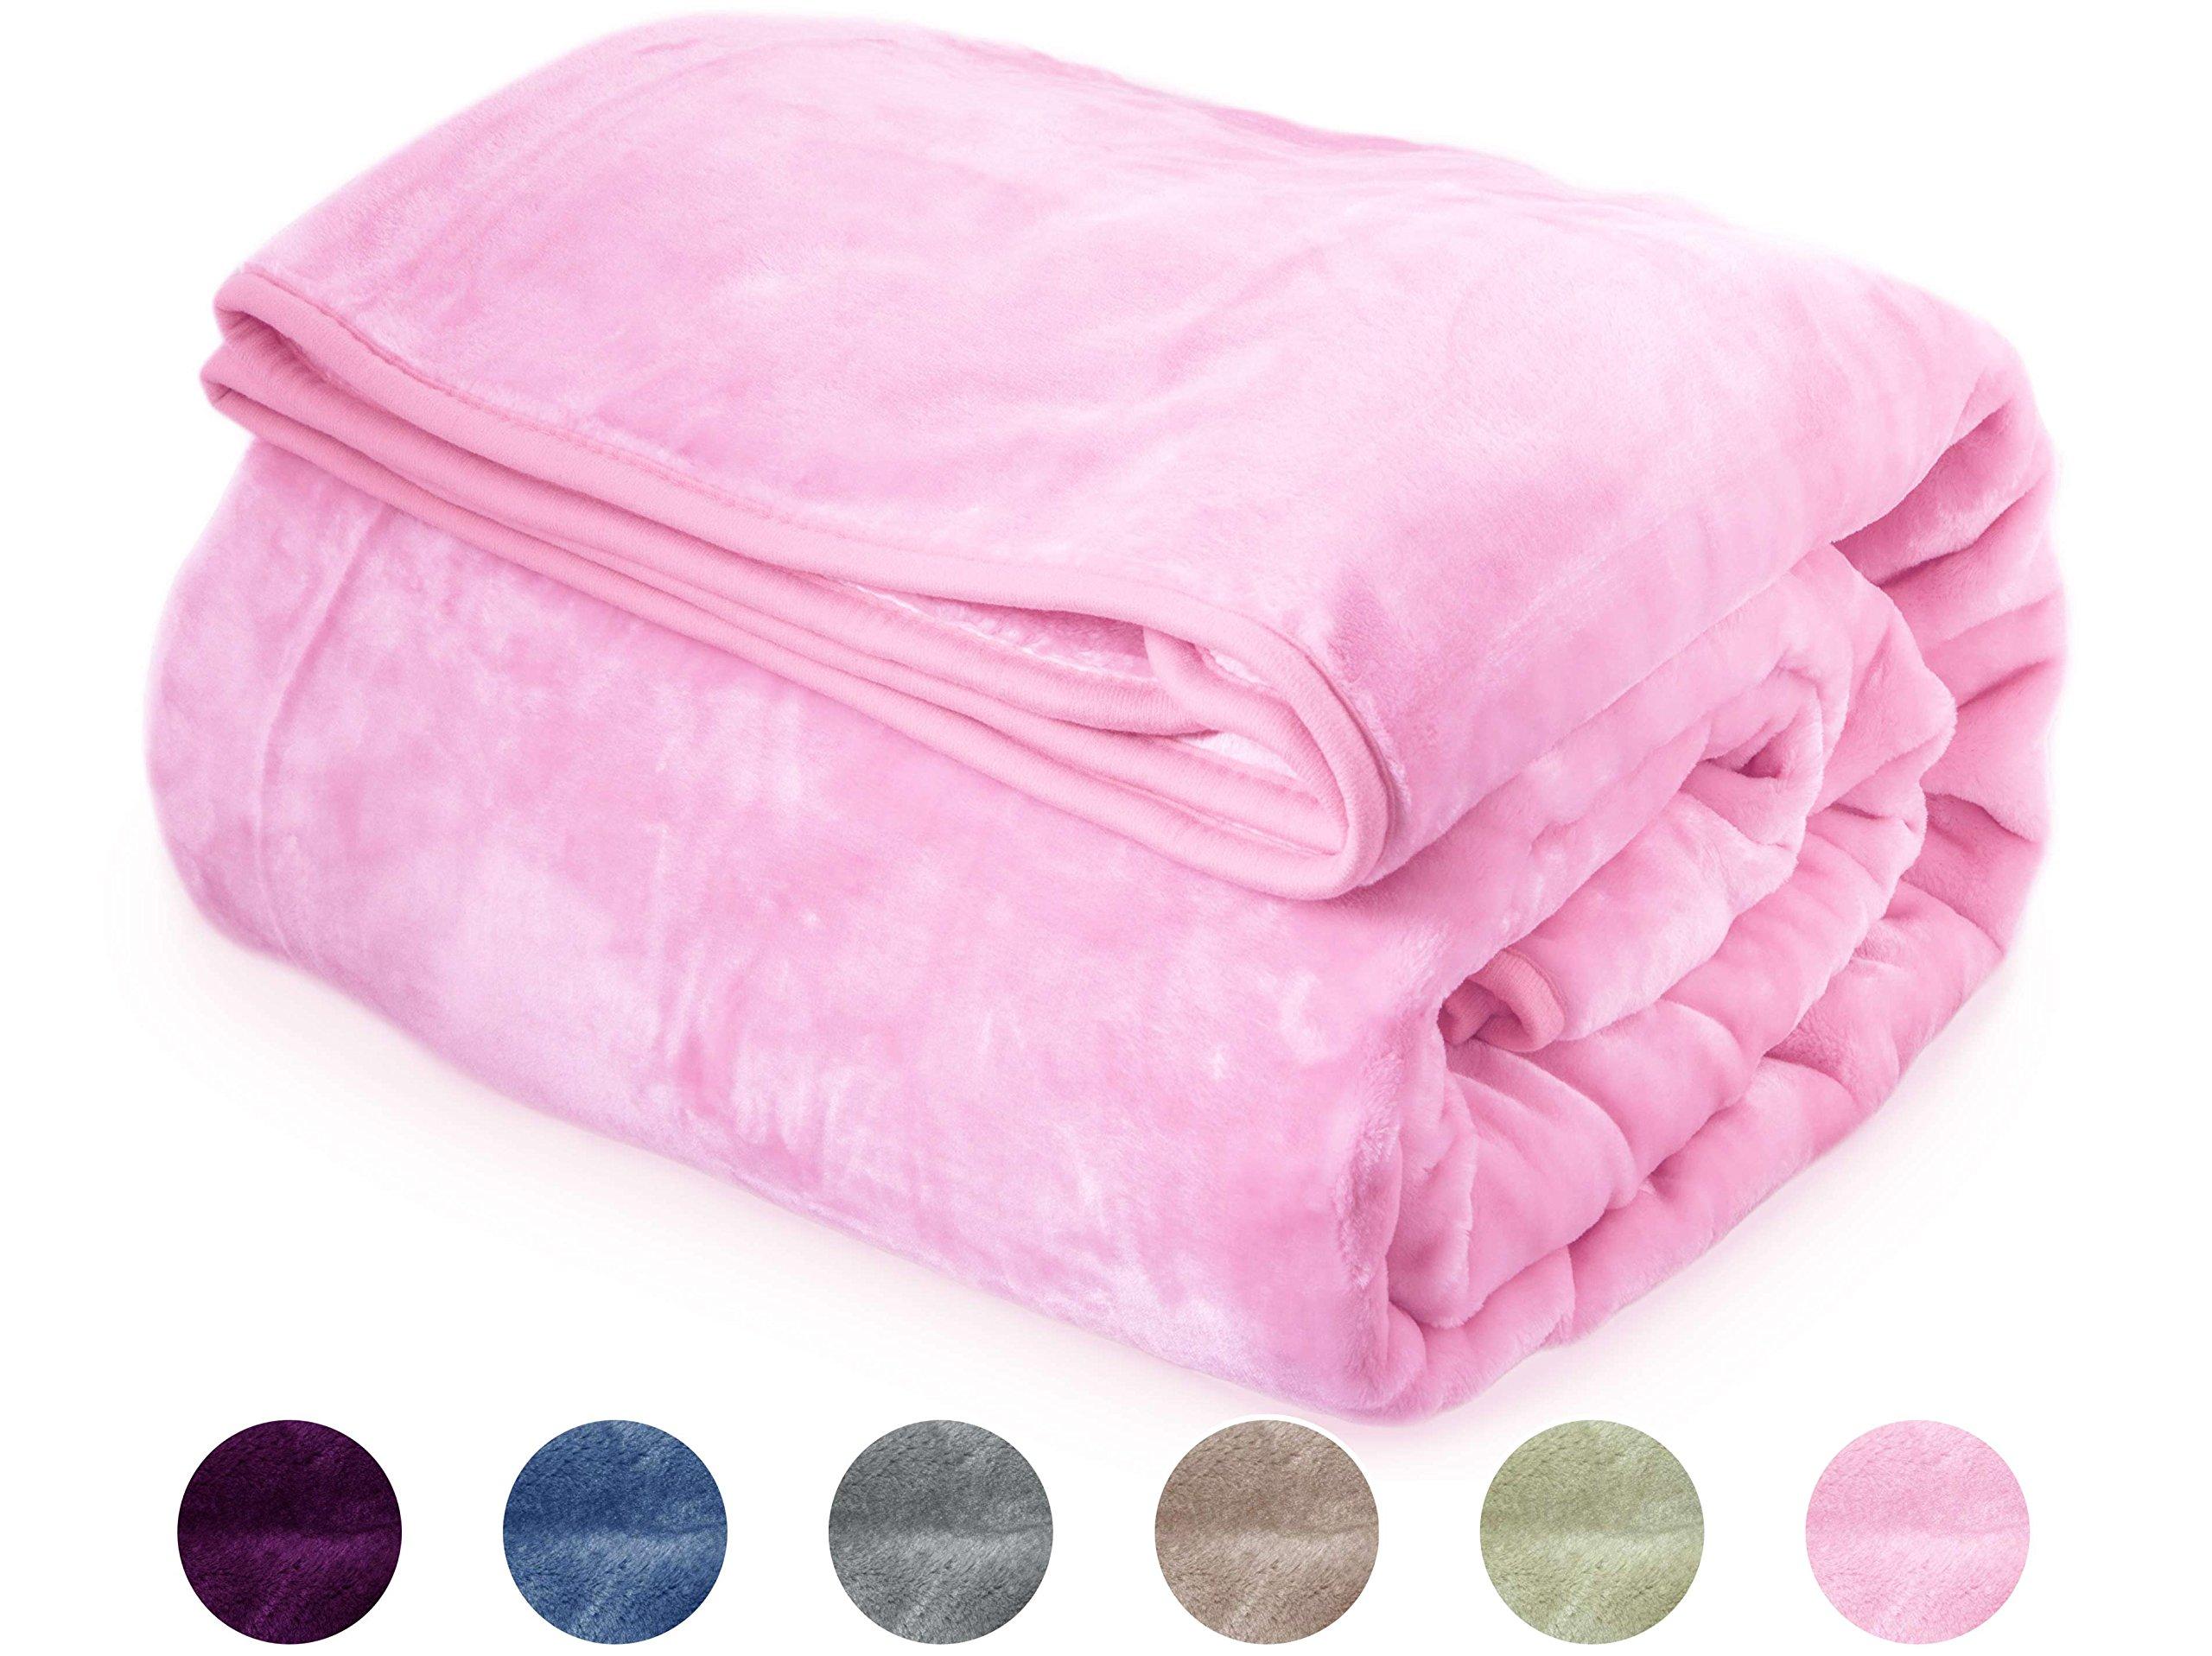 "Archangel Ultra Silky Soft Heavy Duty Quality Korean Mink Reversible Cloud Blanket Solid Silver Pink Queen 83""x94"""